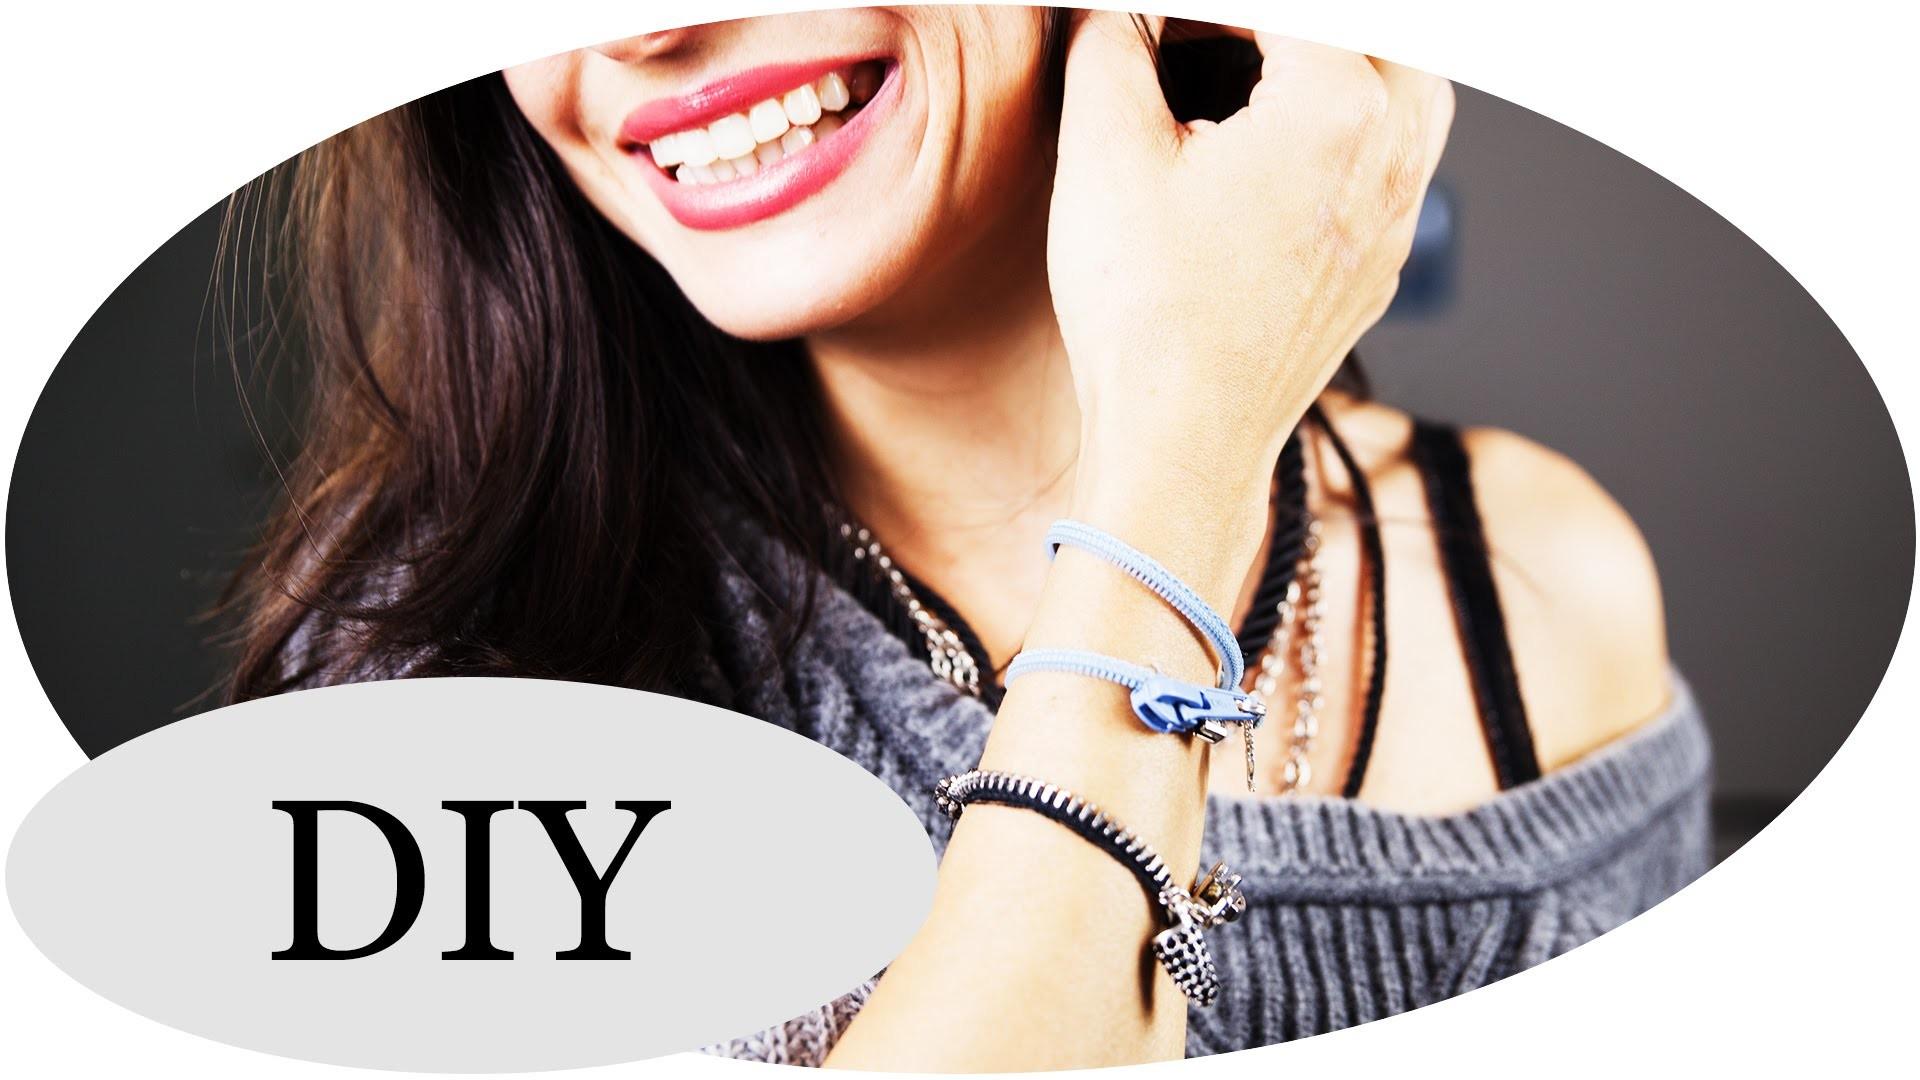 DIY Armband aus Reißverschlüssen -